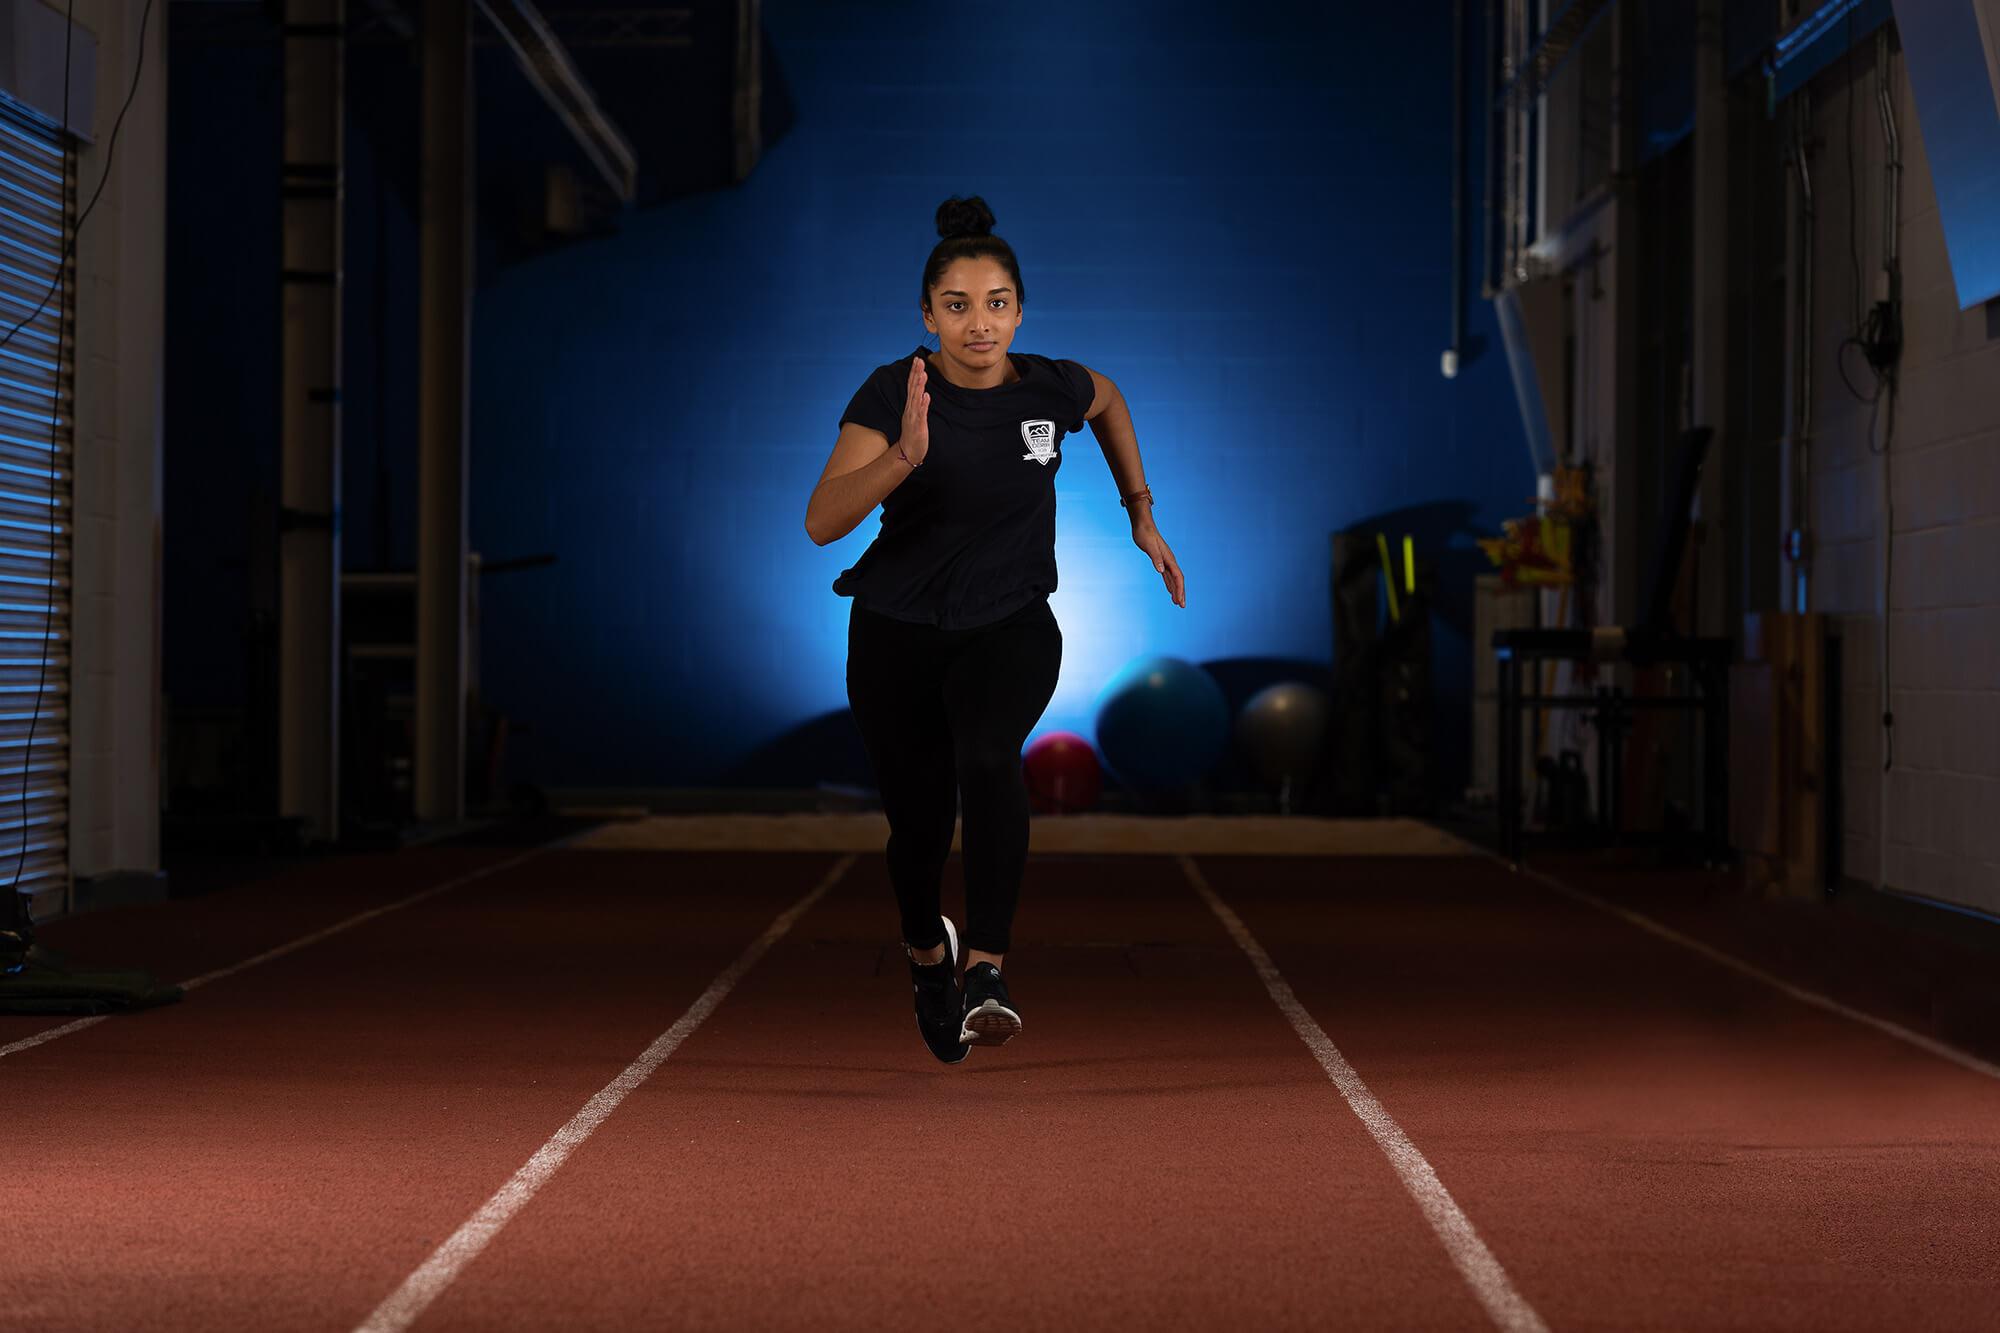 30m lane indoor sprint track in the Performance Suite